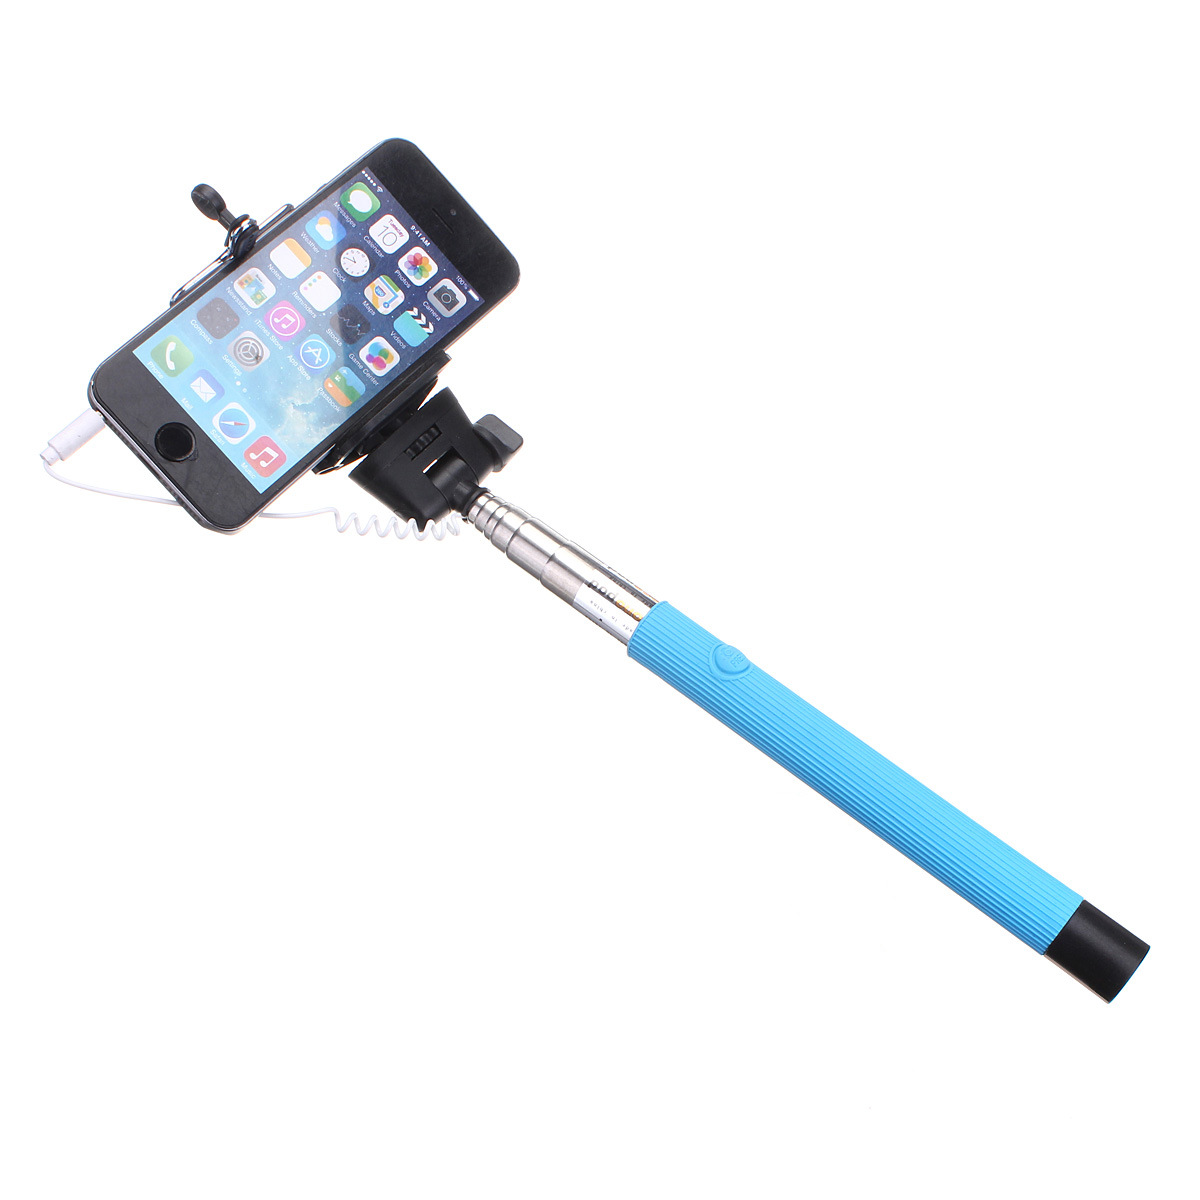 106cm telescopic handheld monopod selfie stick green lazada ph. Black Bedroom Furniture Sets. Home Design Ideas